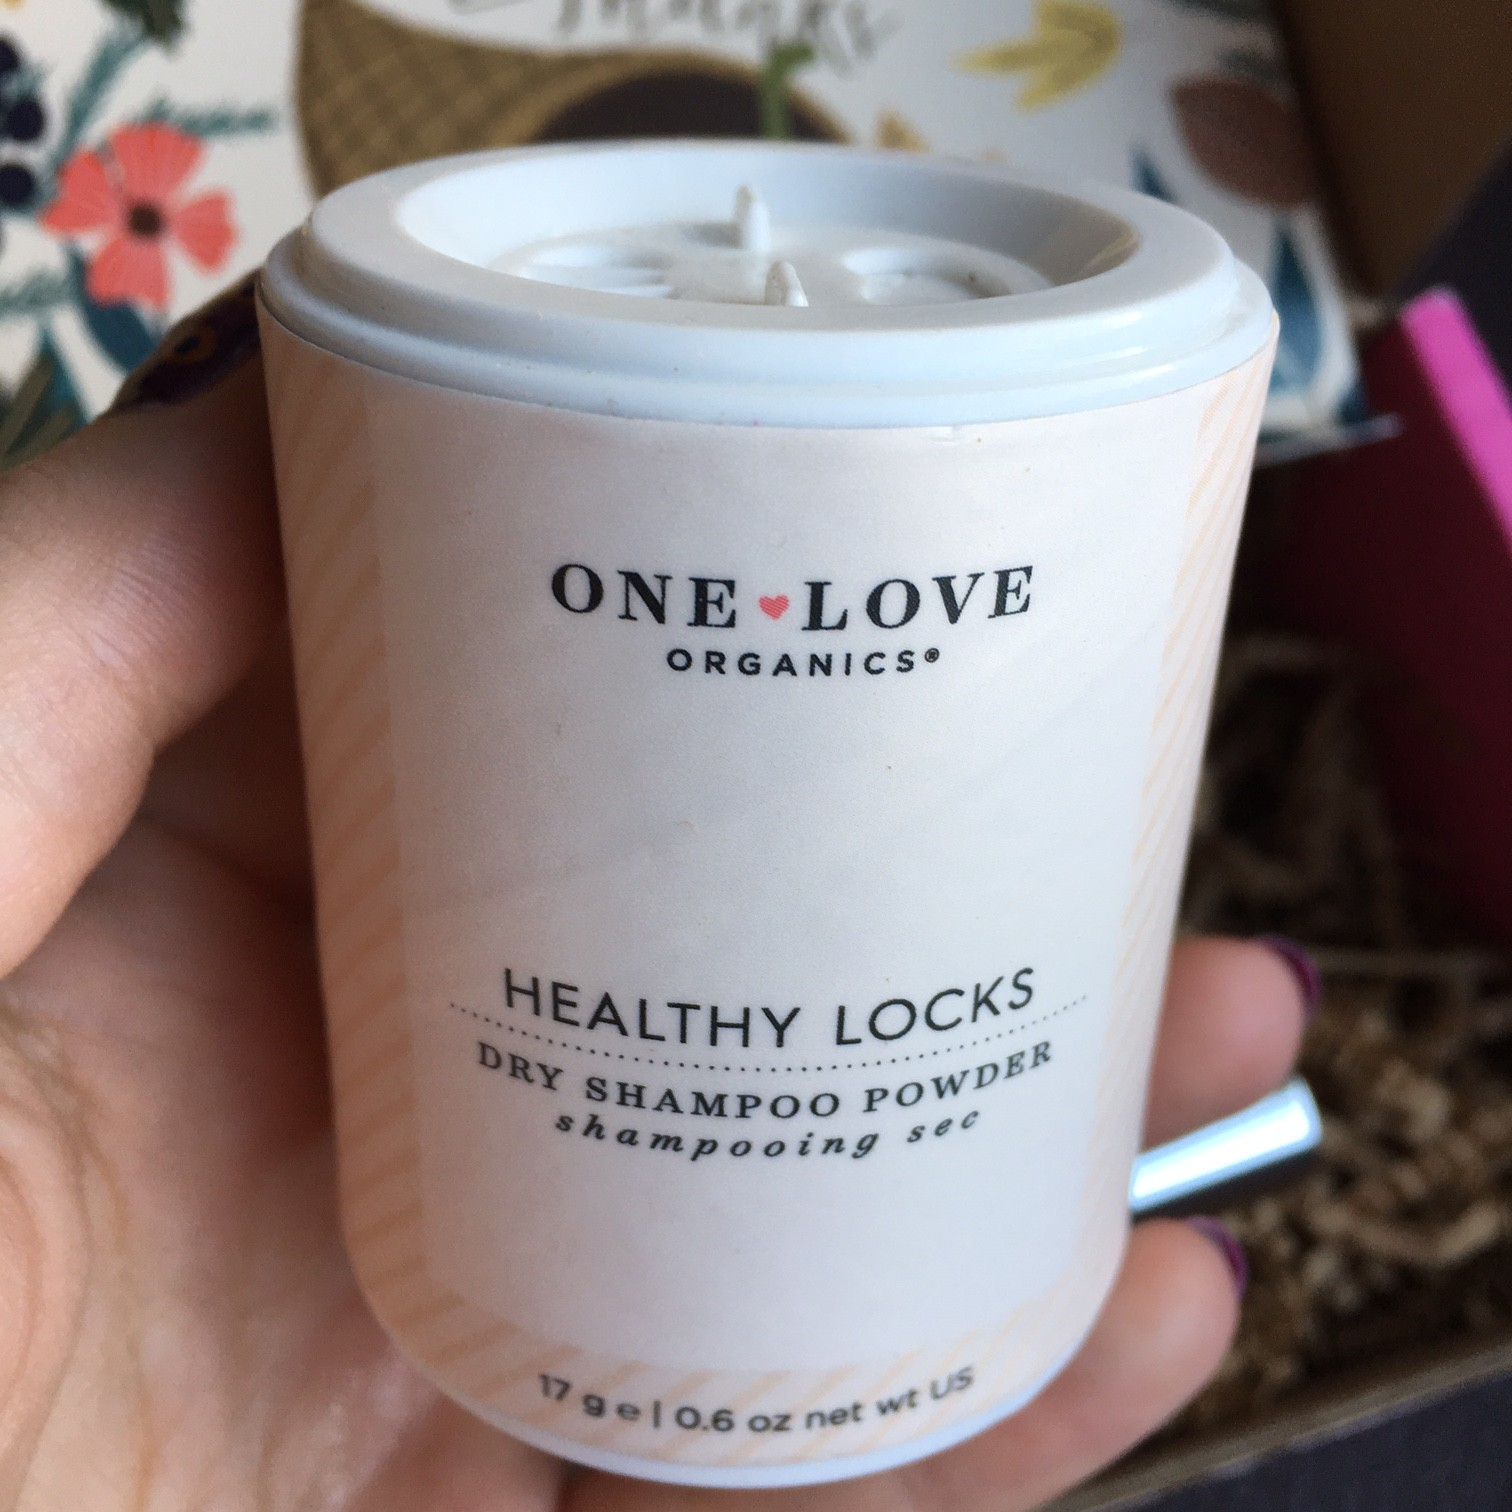 One Love Organics Healthy Locks Dry Shampoo